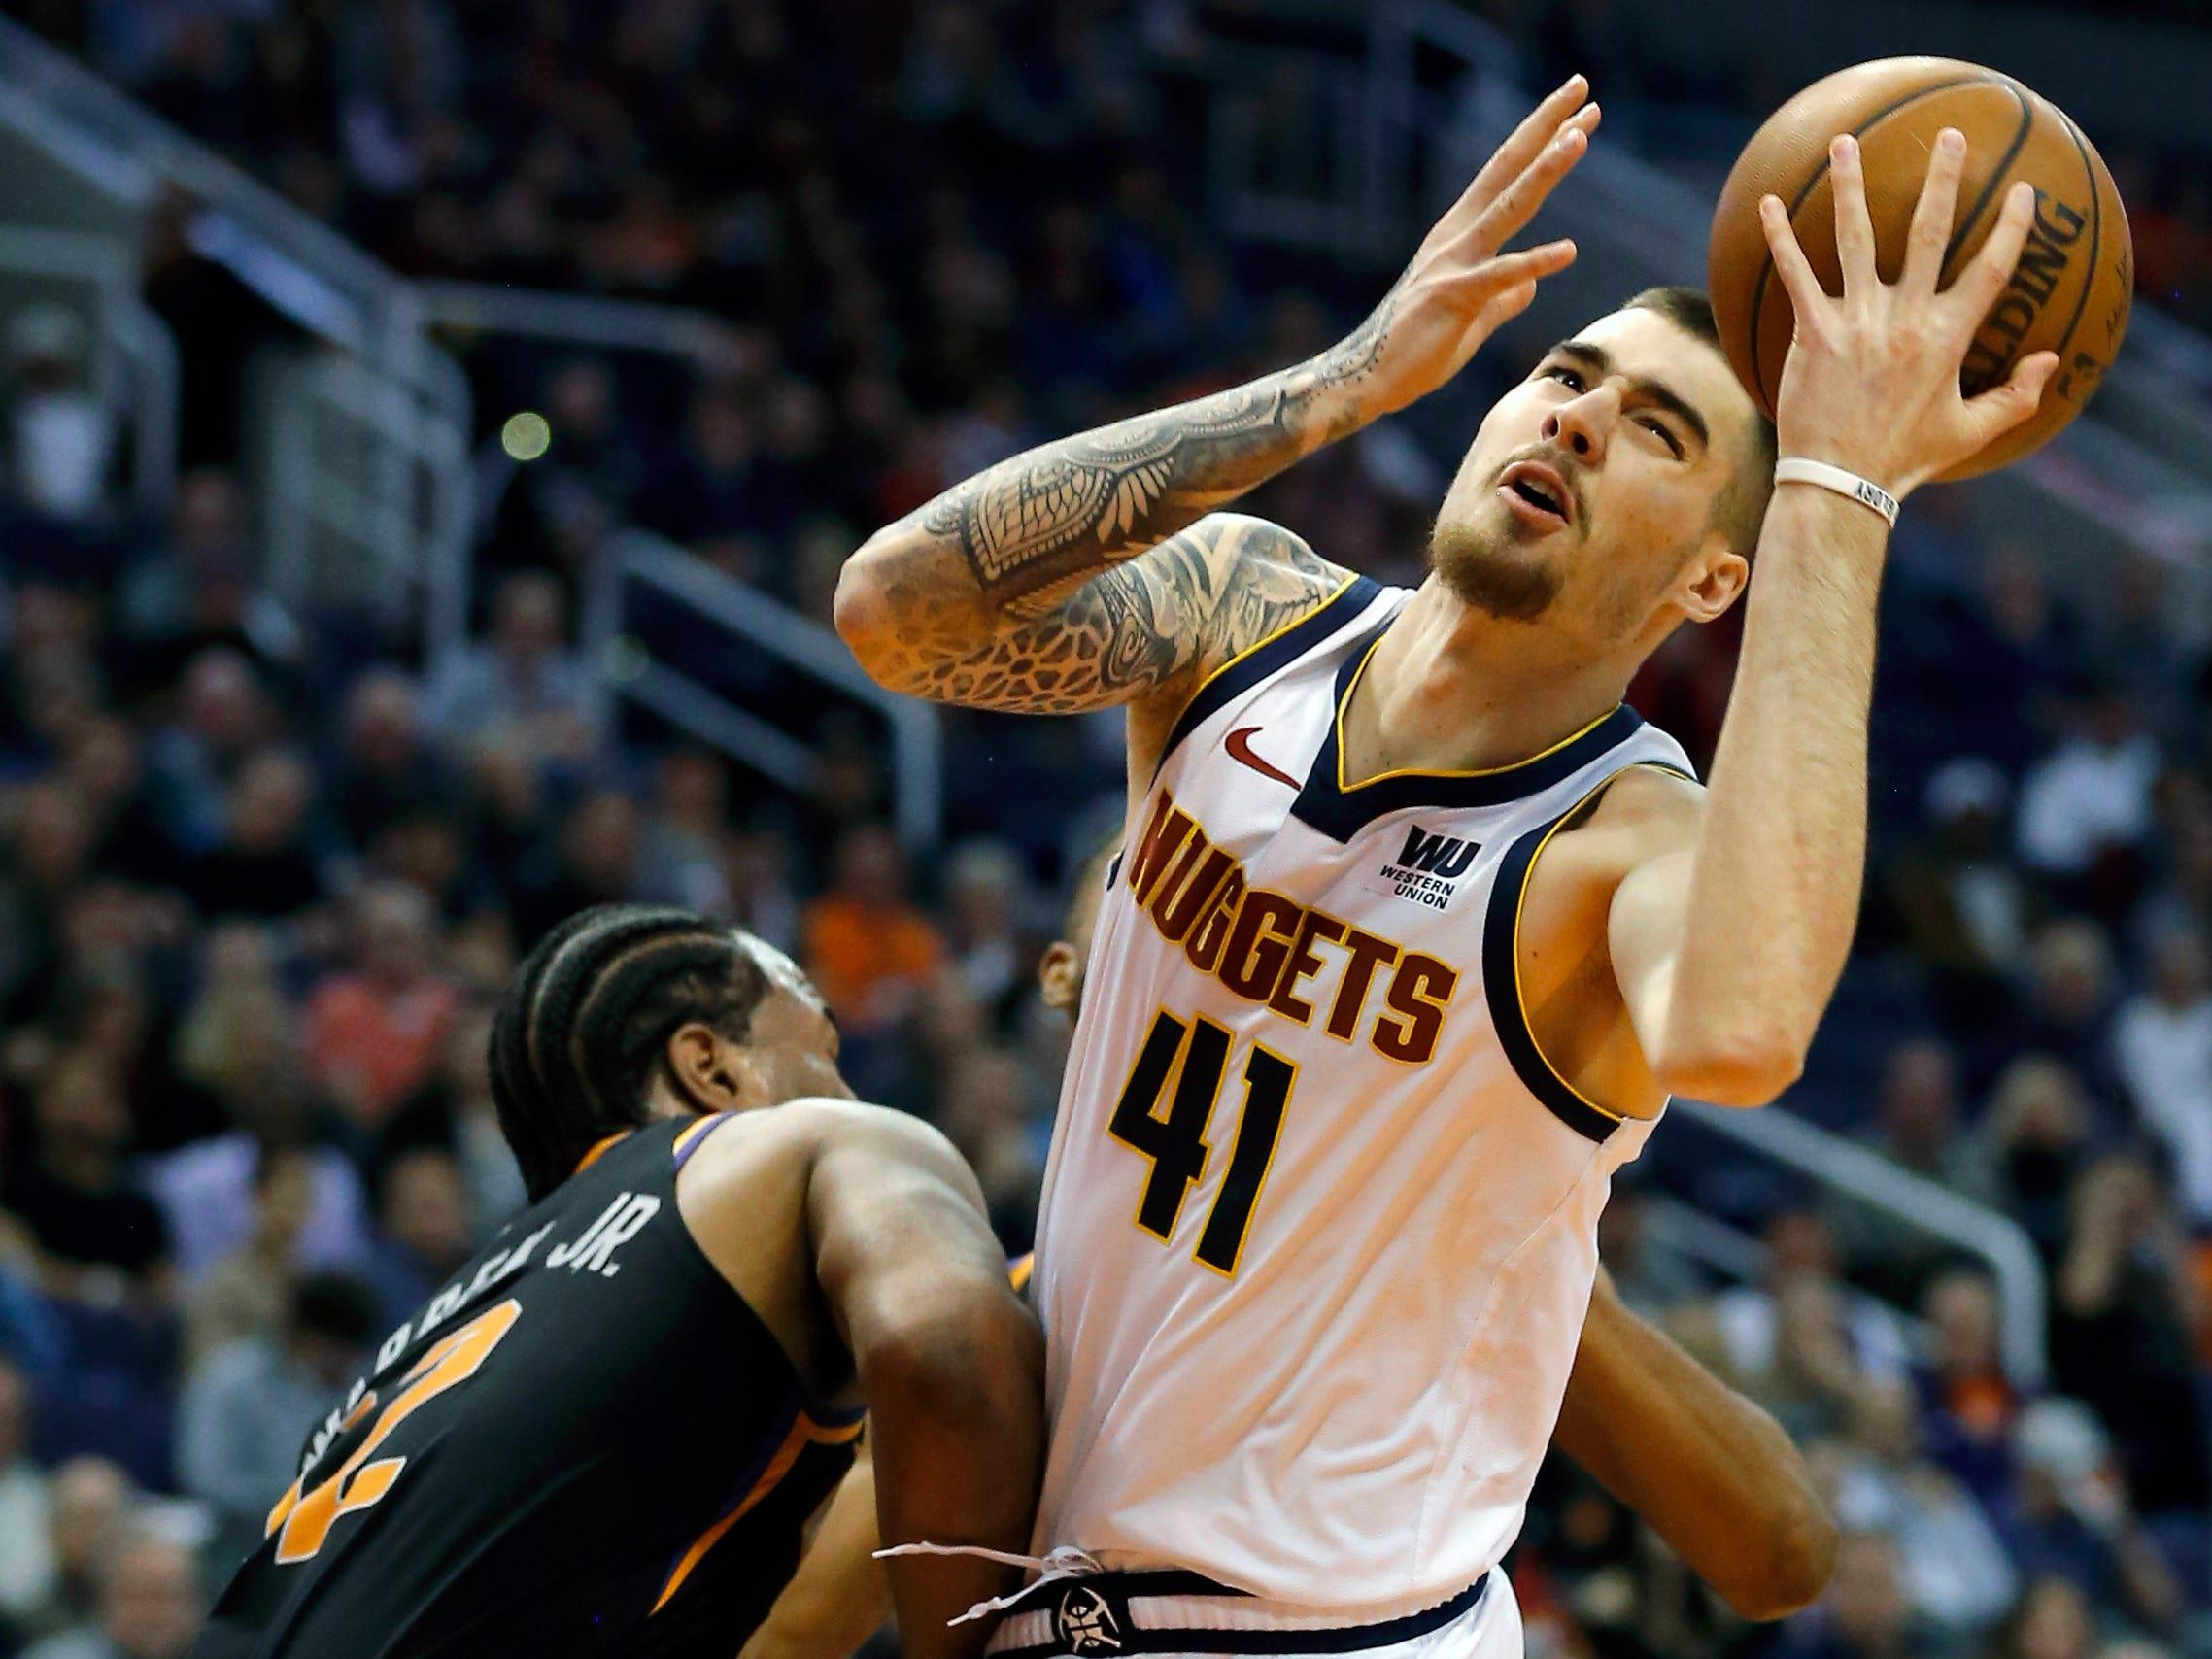 Denver Nuggets forward Juan Hernangomez (41) drives on Phoenix Suns forward T.J. Warren, Saturday, Jan. 12, 2019, in Phoenix. (AP Photo/Rick Scuteri)